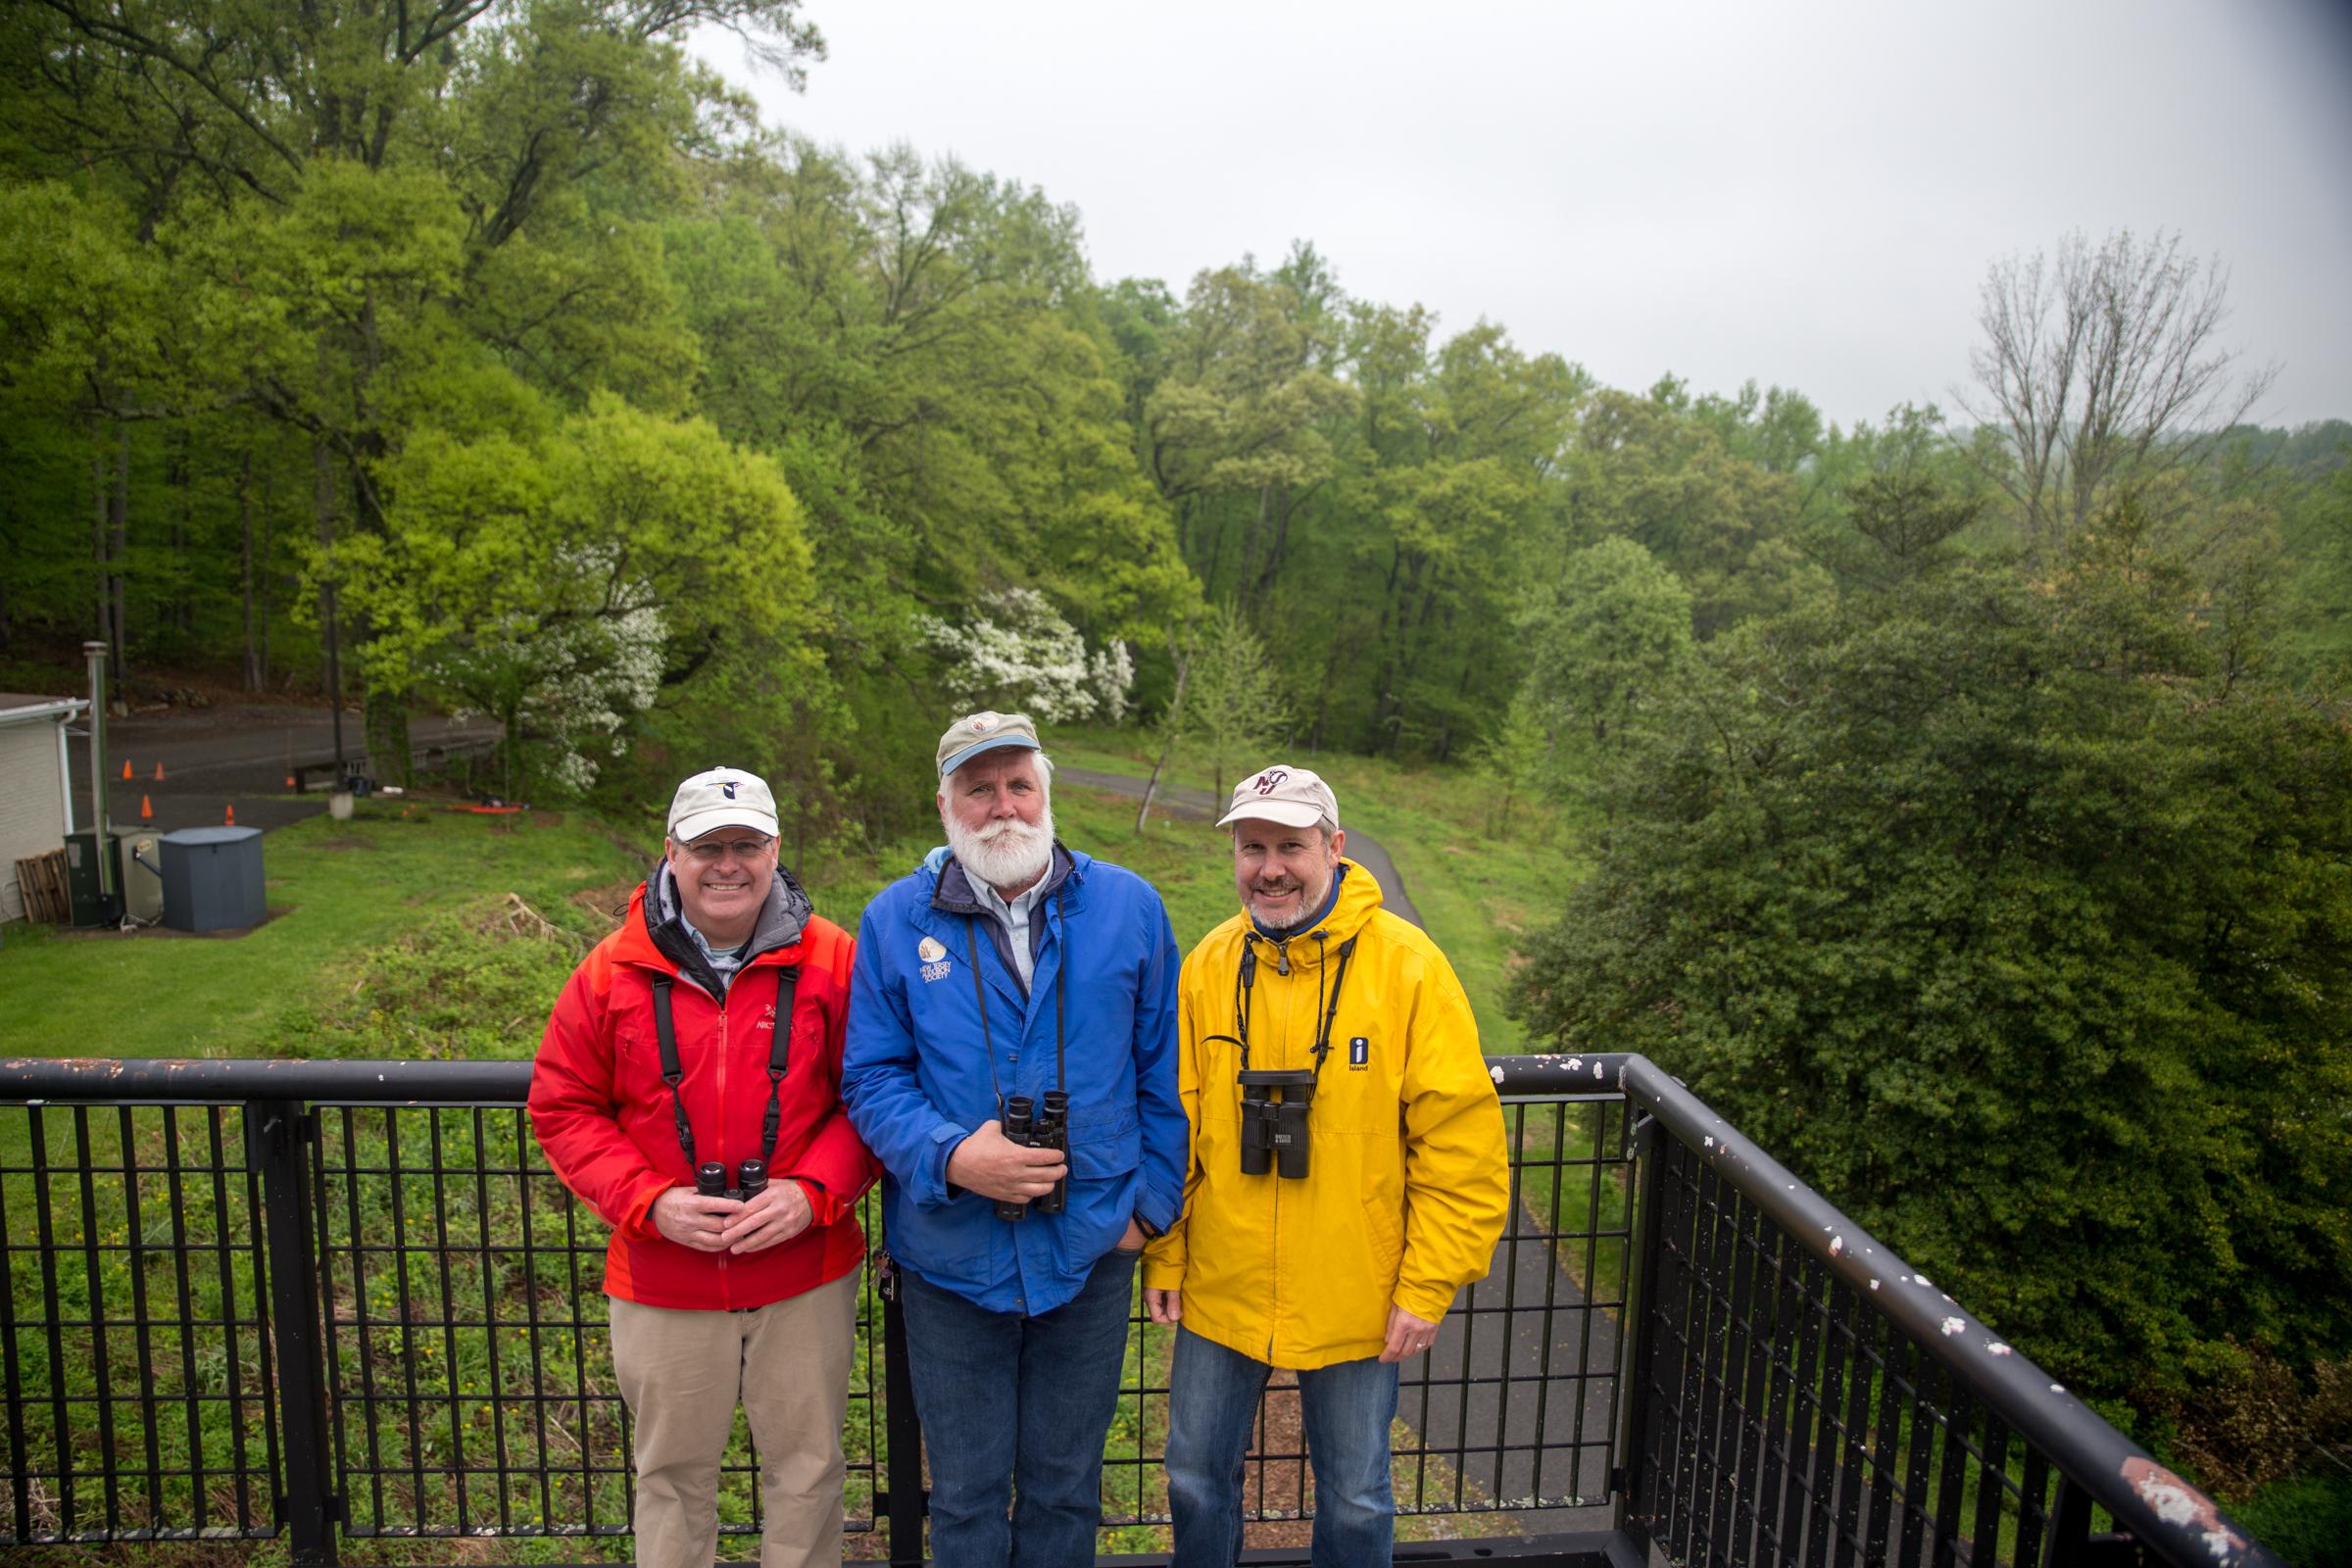 Deckcissels: Ron Barkley, Mike Anderson, Dan Barkley Camilla Cerea/Audubon